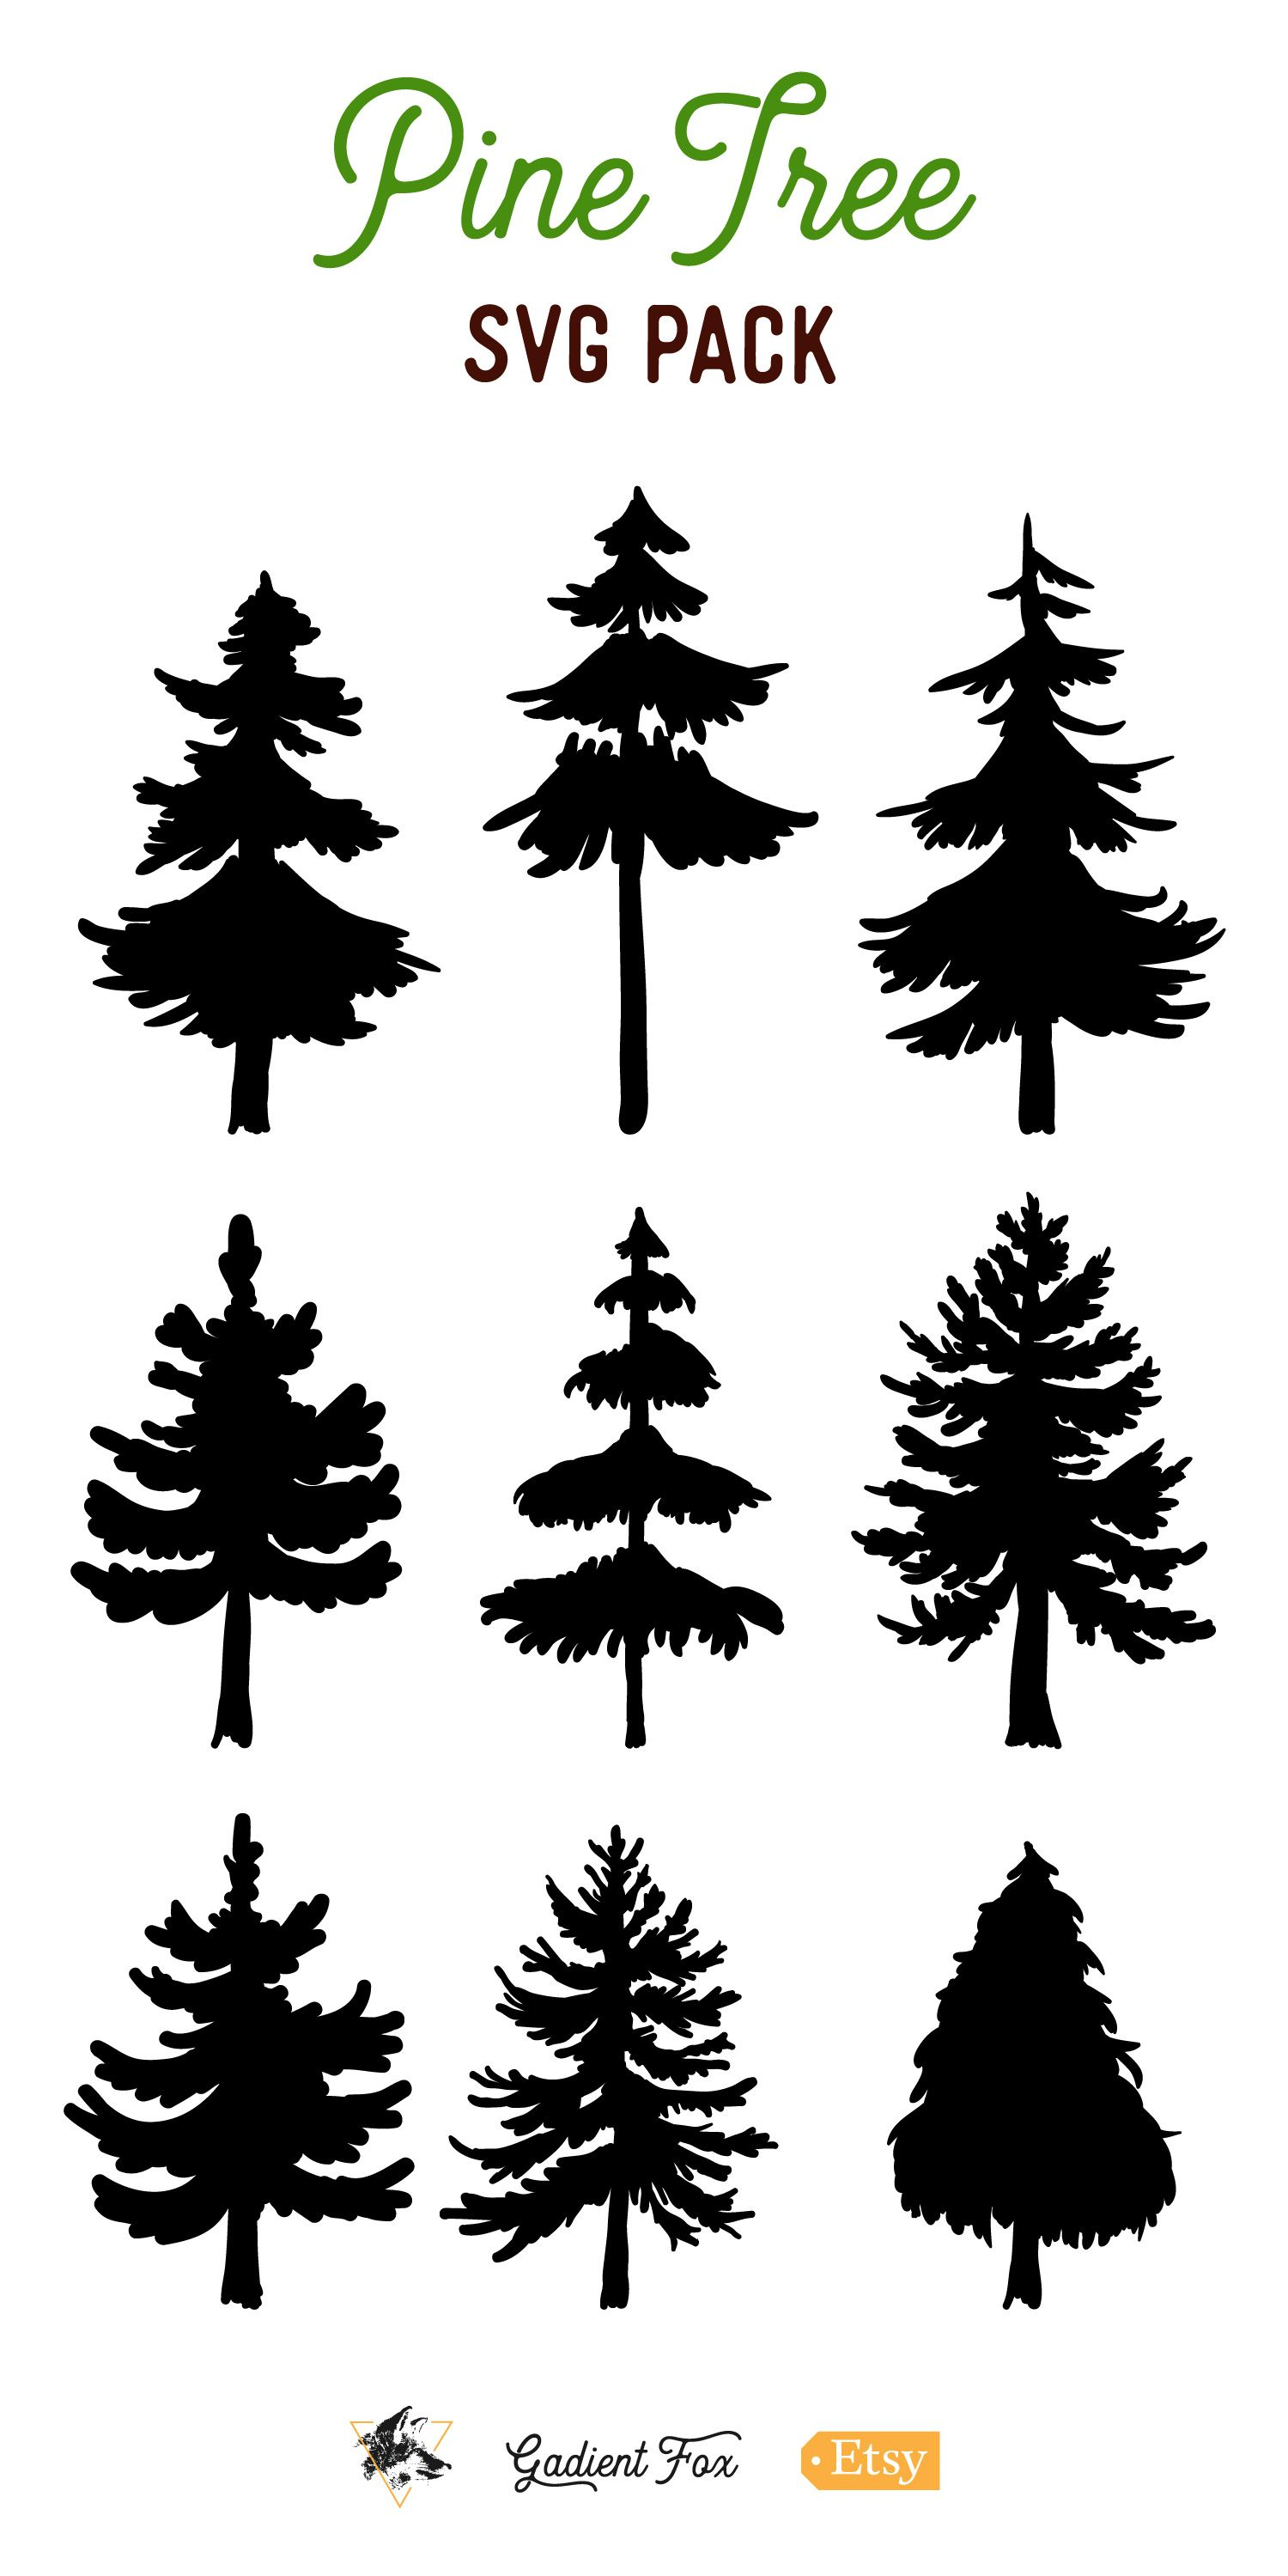 9 Vector Pine Tree Silhouette Illustrations Pine tree